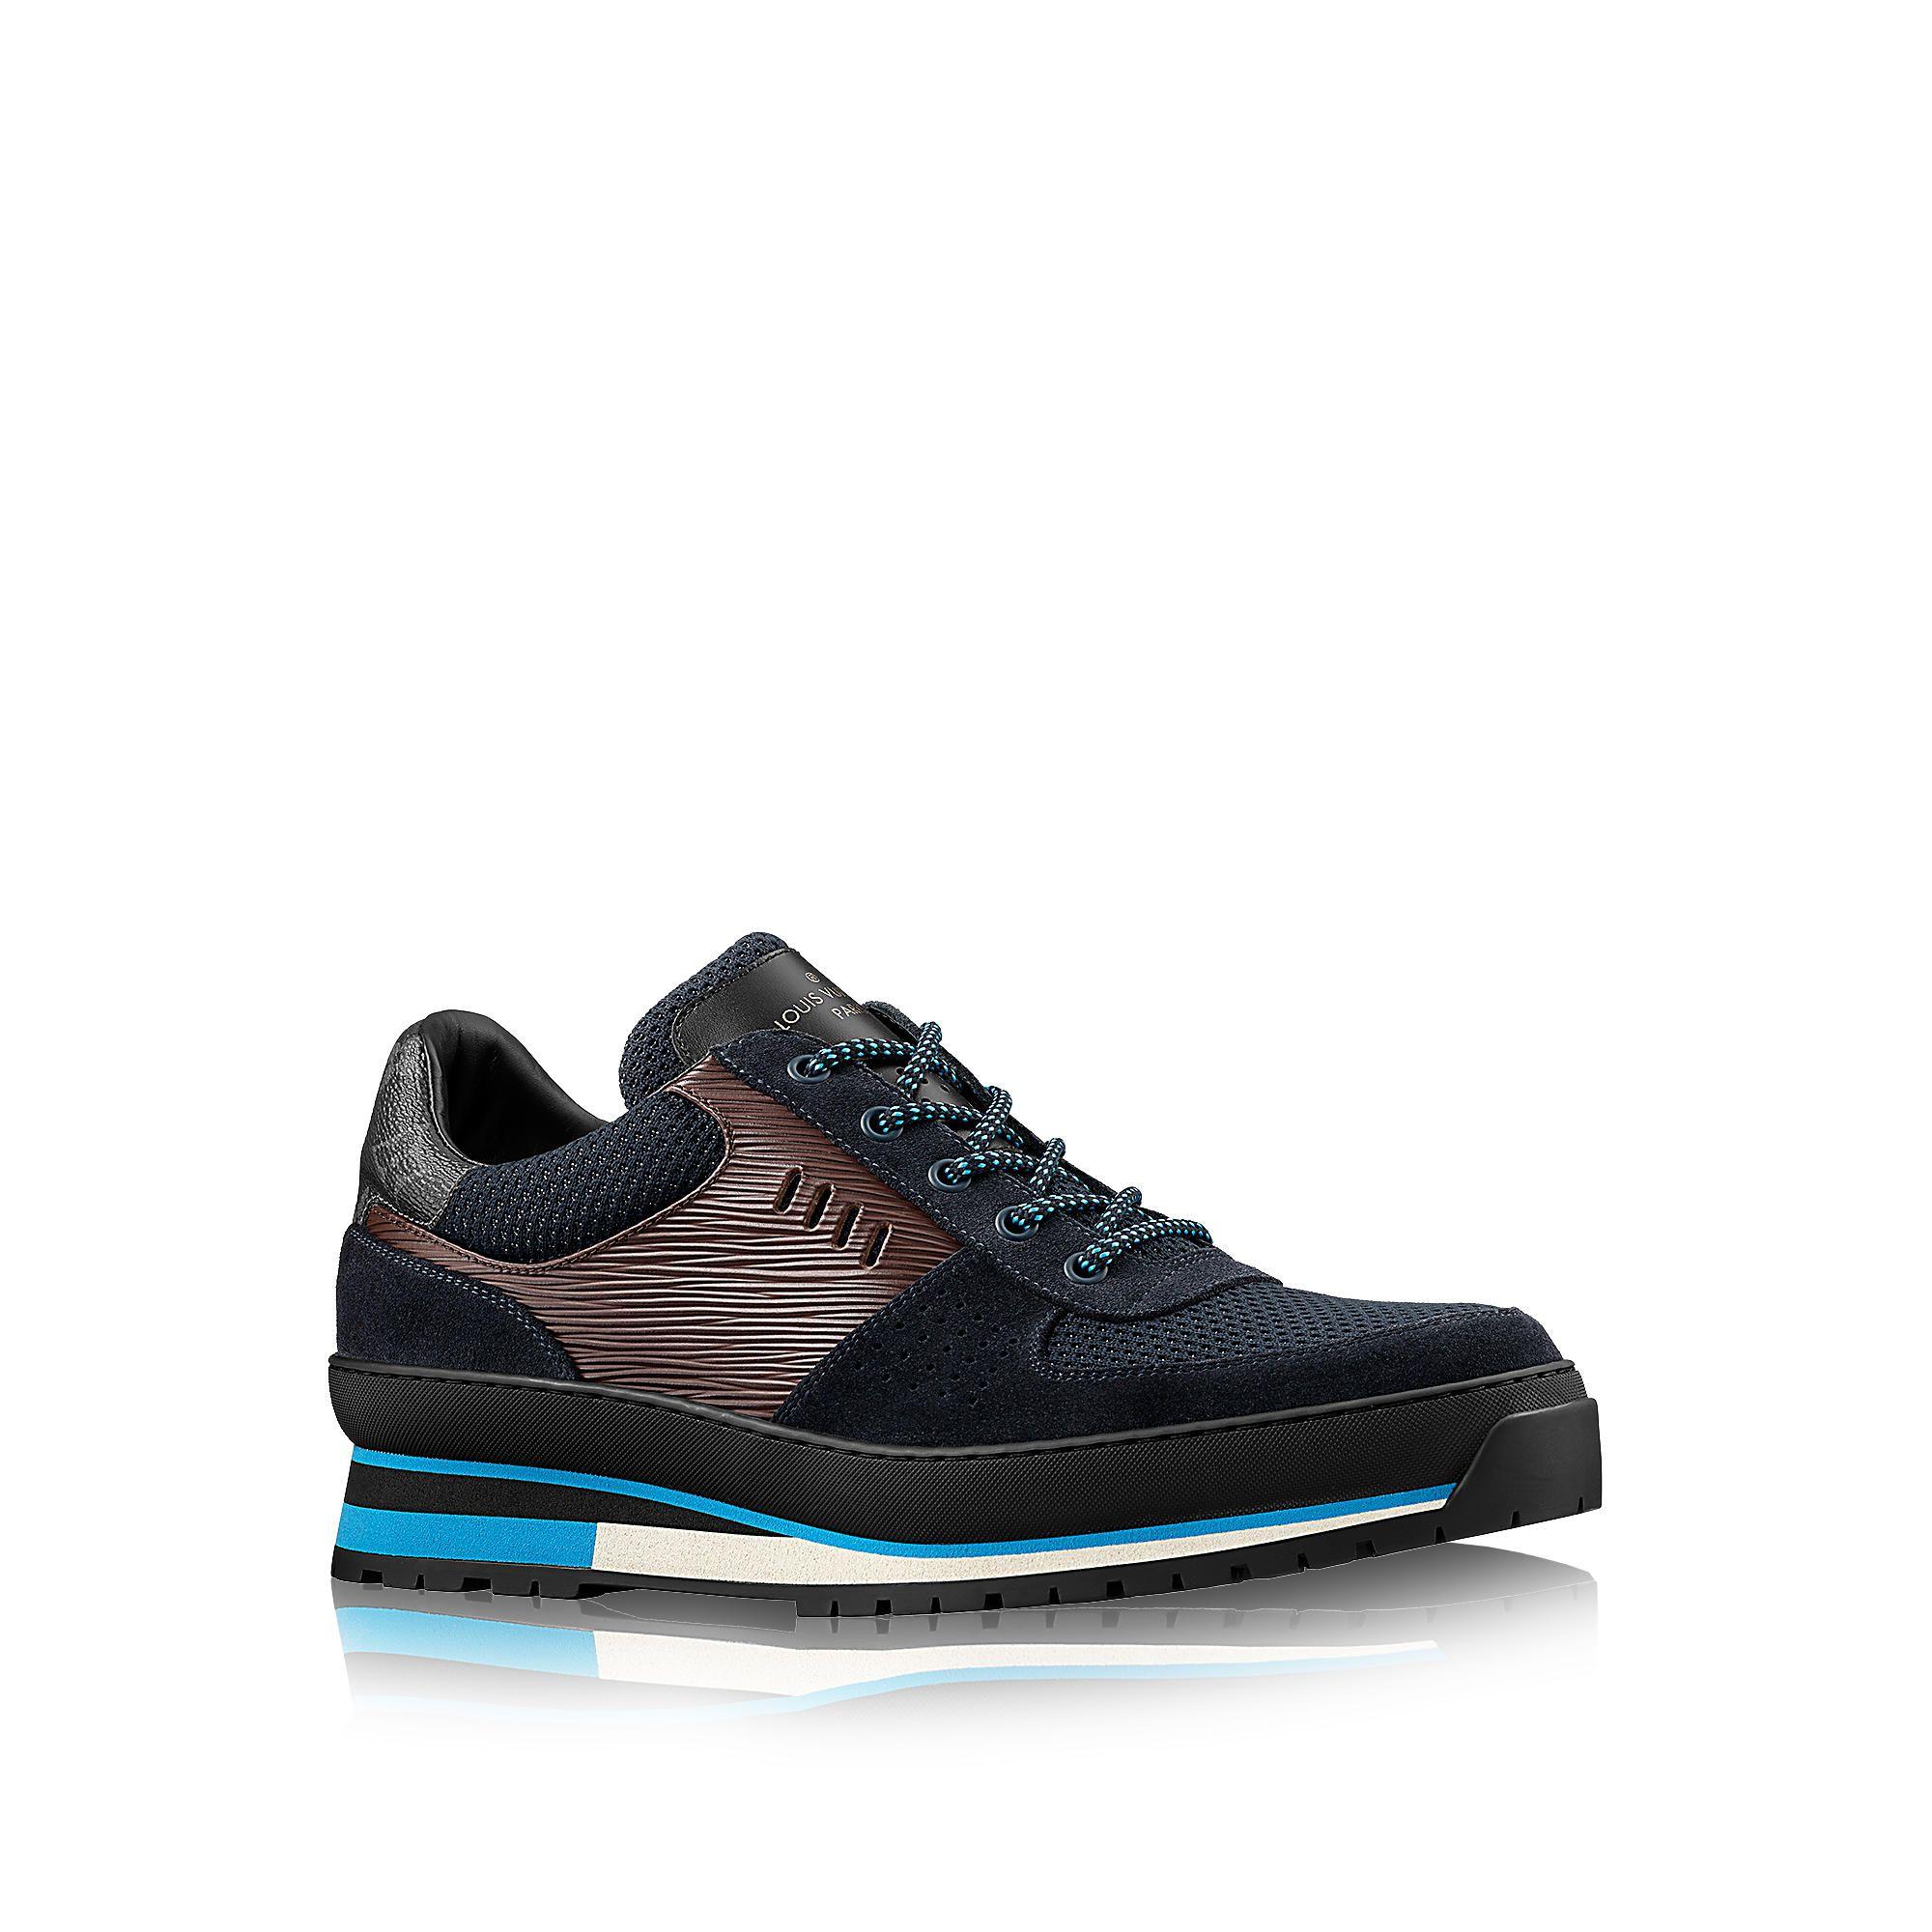 SHOES Harlem Sneaker   Louis Vuitton ®   boots   Pinterest   Louis vuitton,  Website and Products